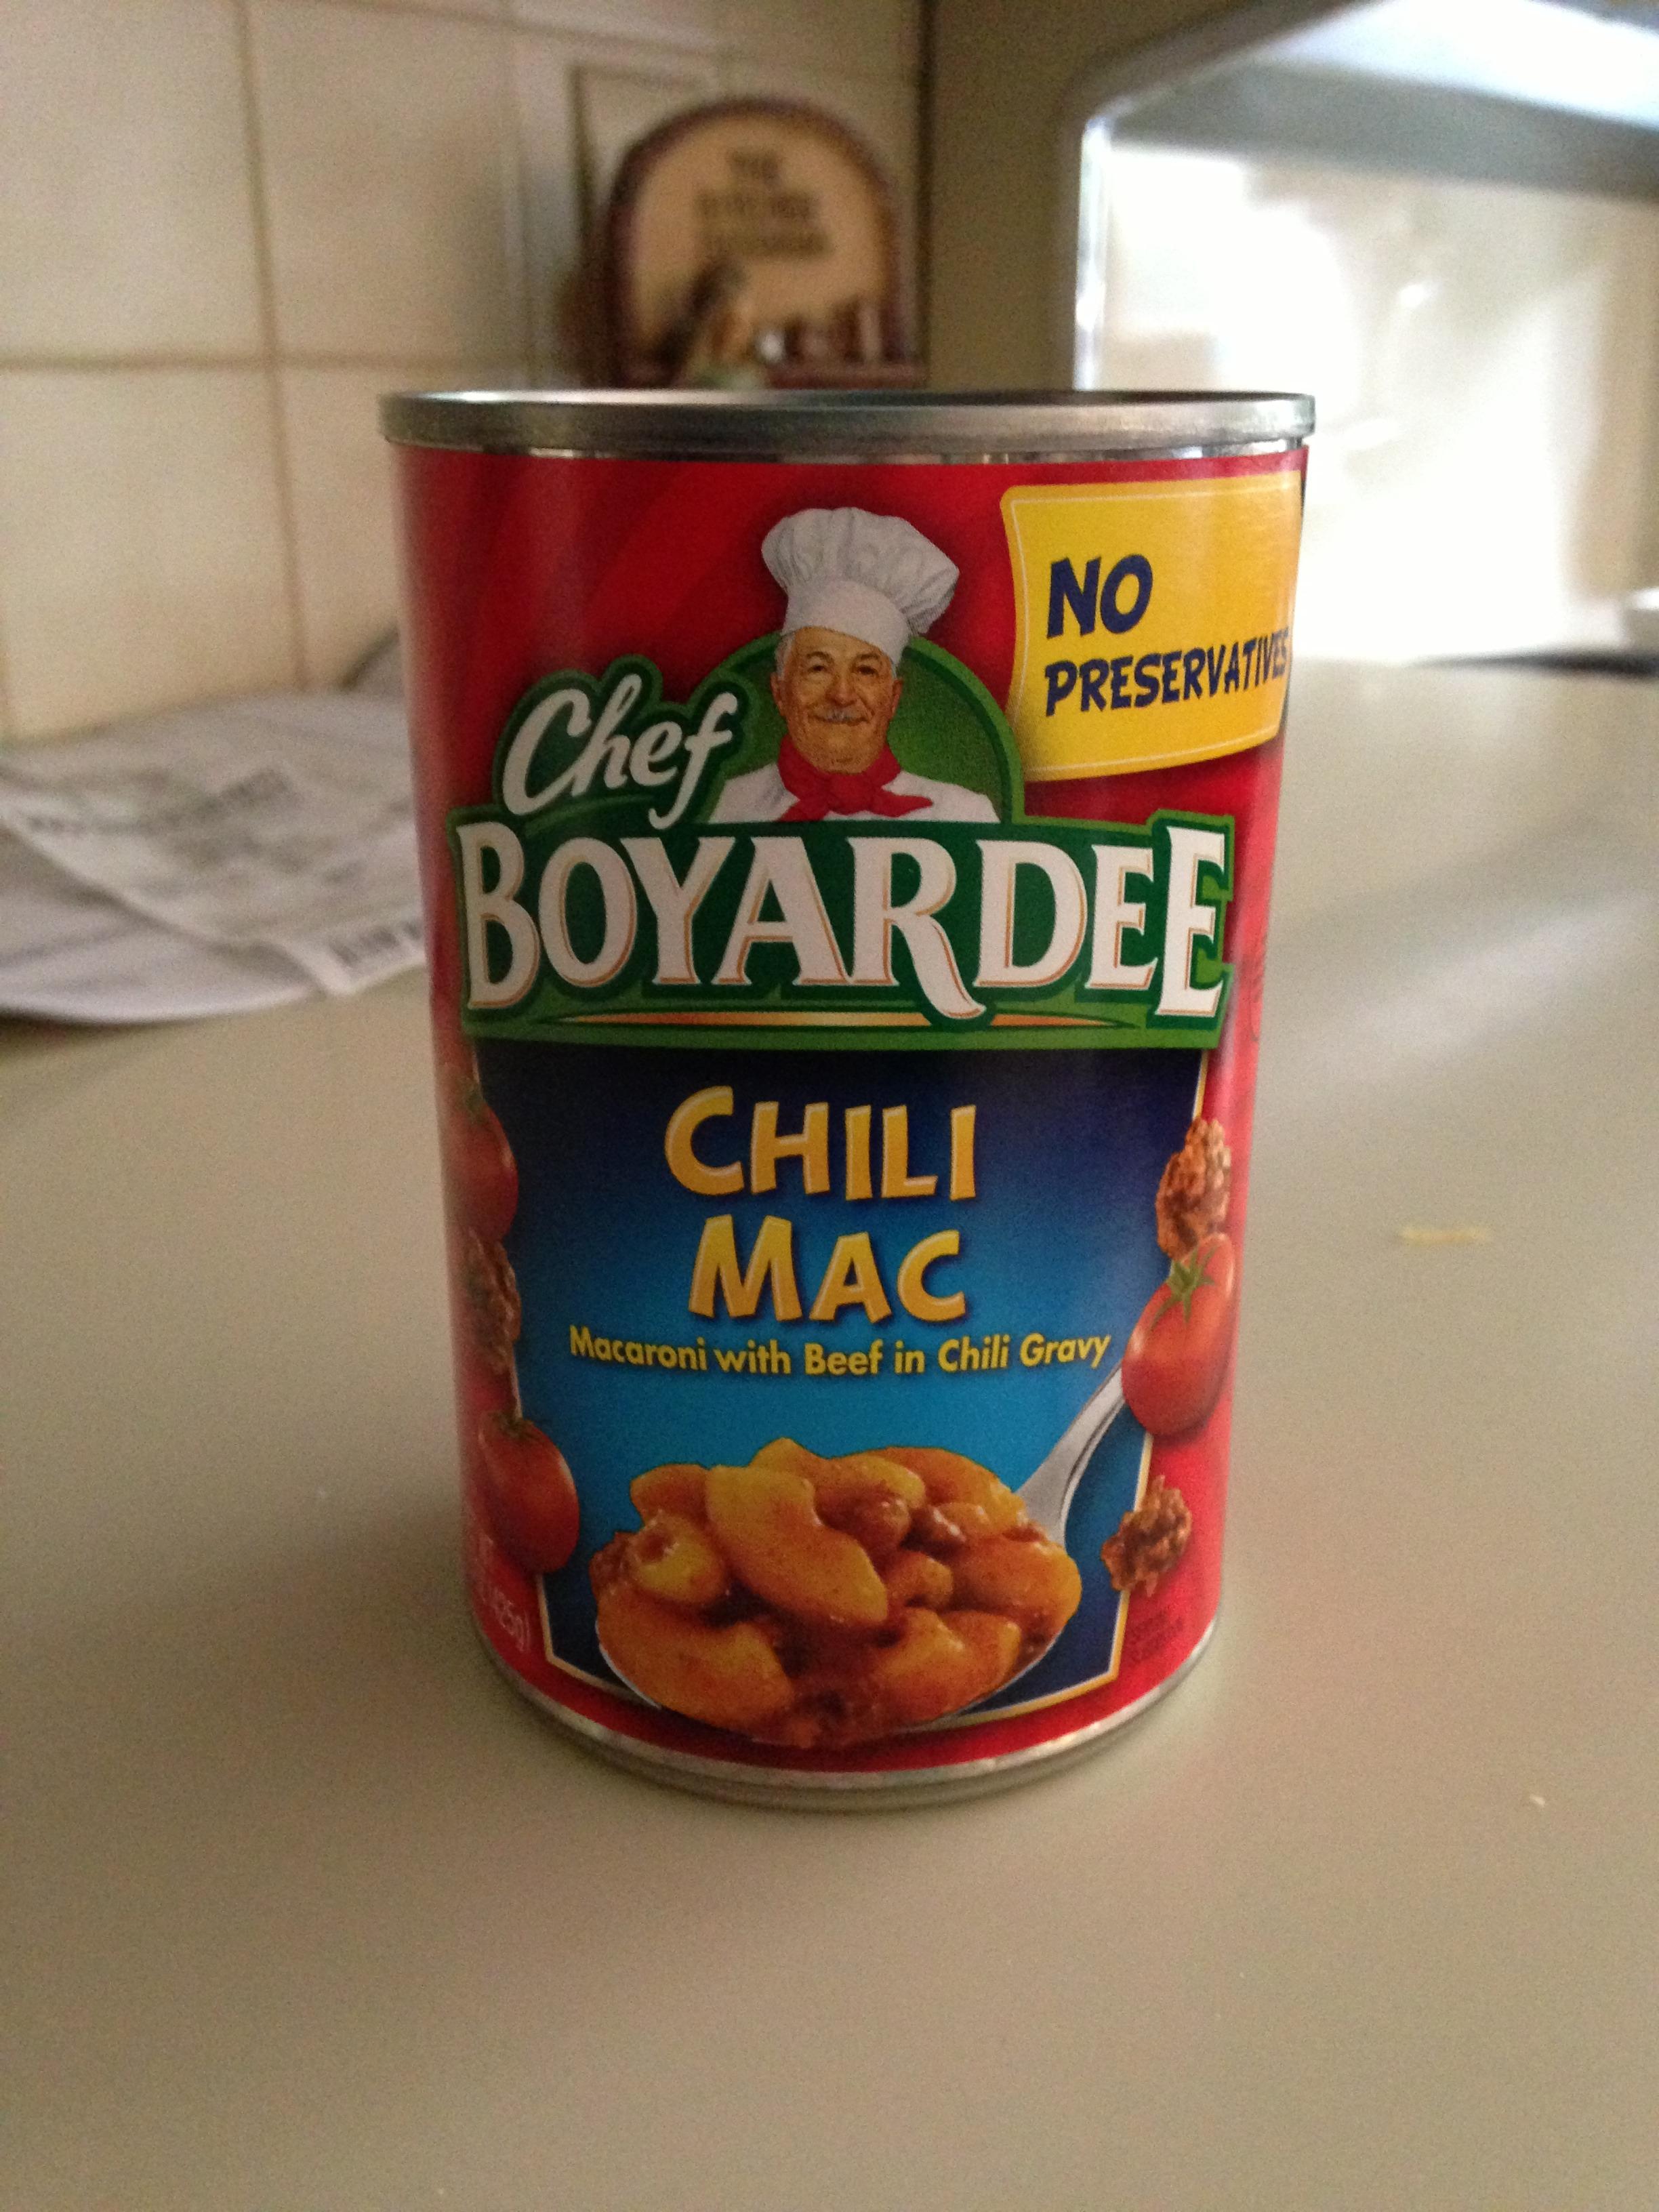 How To Eat Chef Boyardee